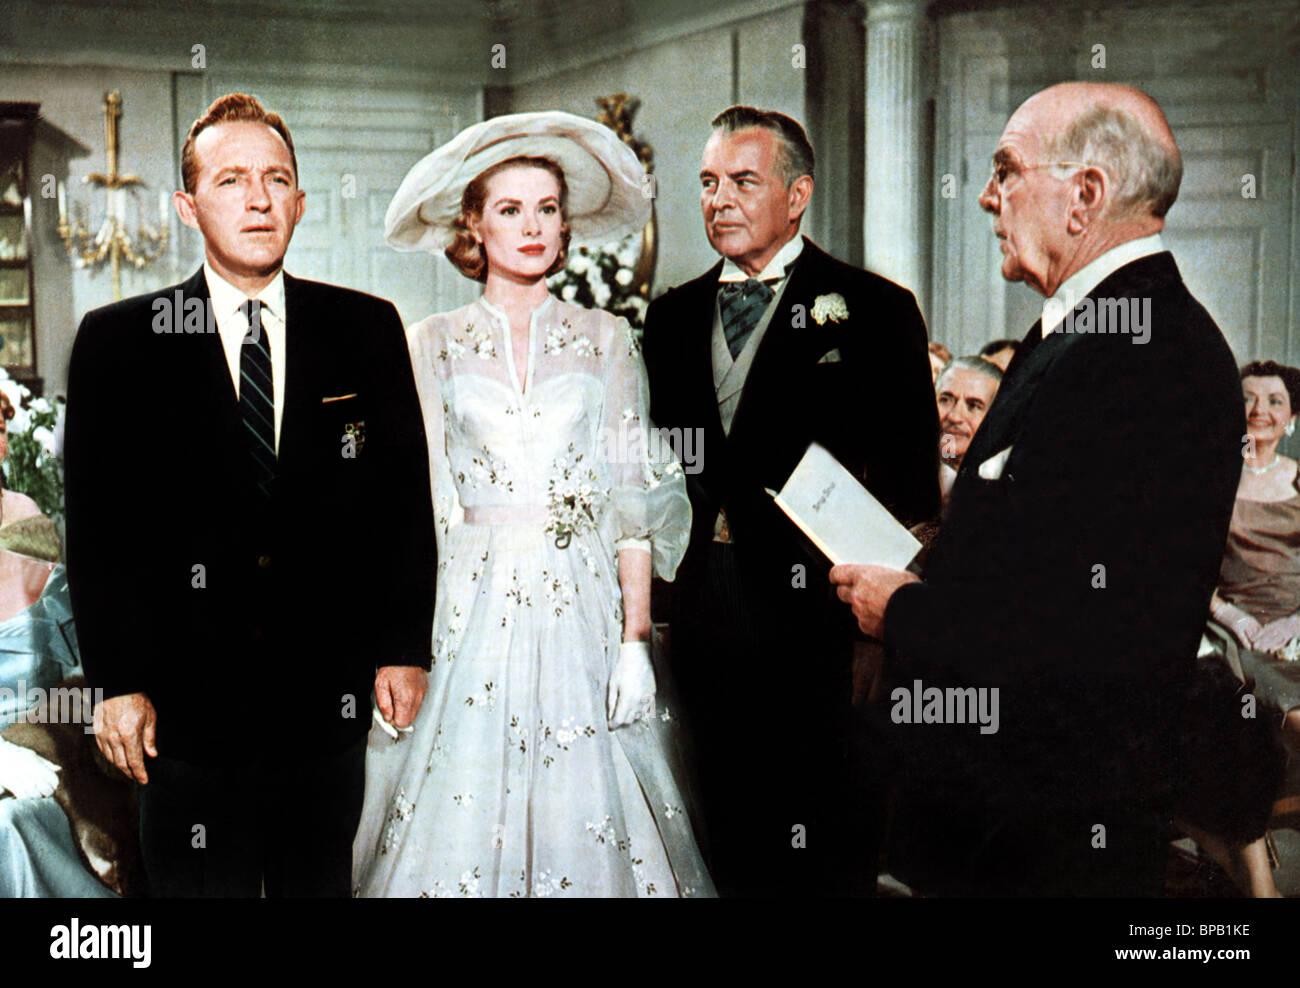 BING CROSBY, GRACE KELLY, SIDNEY BLACKMER, HUGH BOSWELL, HIGH SOCIETY, 1956 - Stock Image